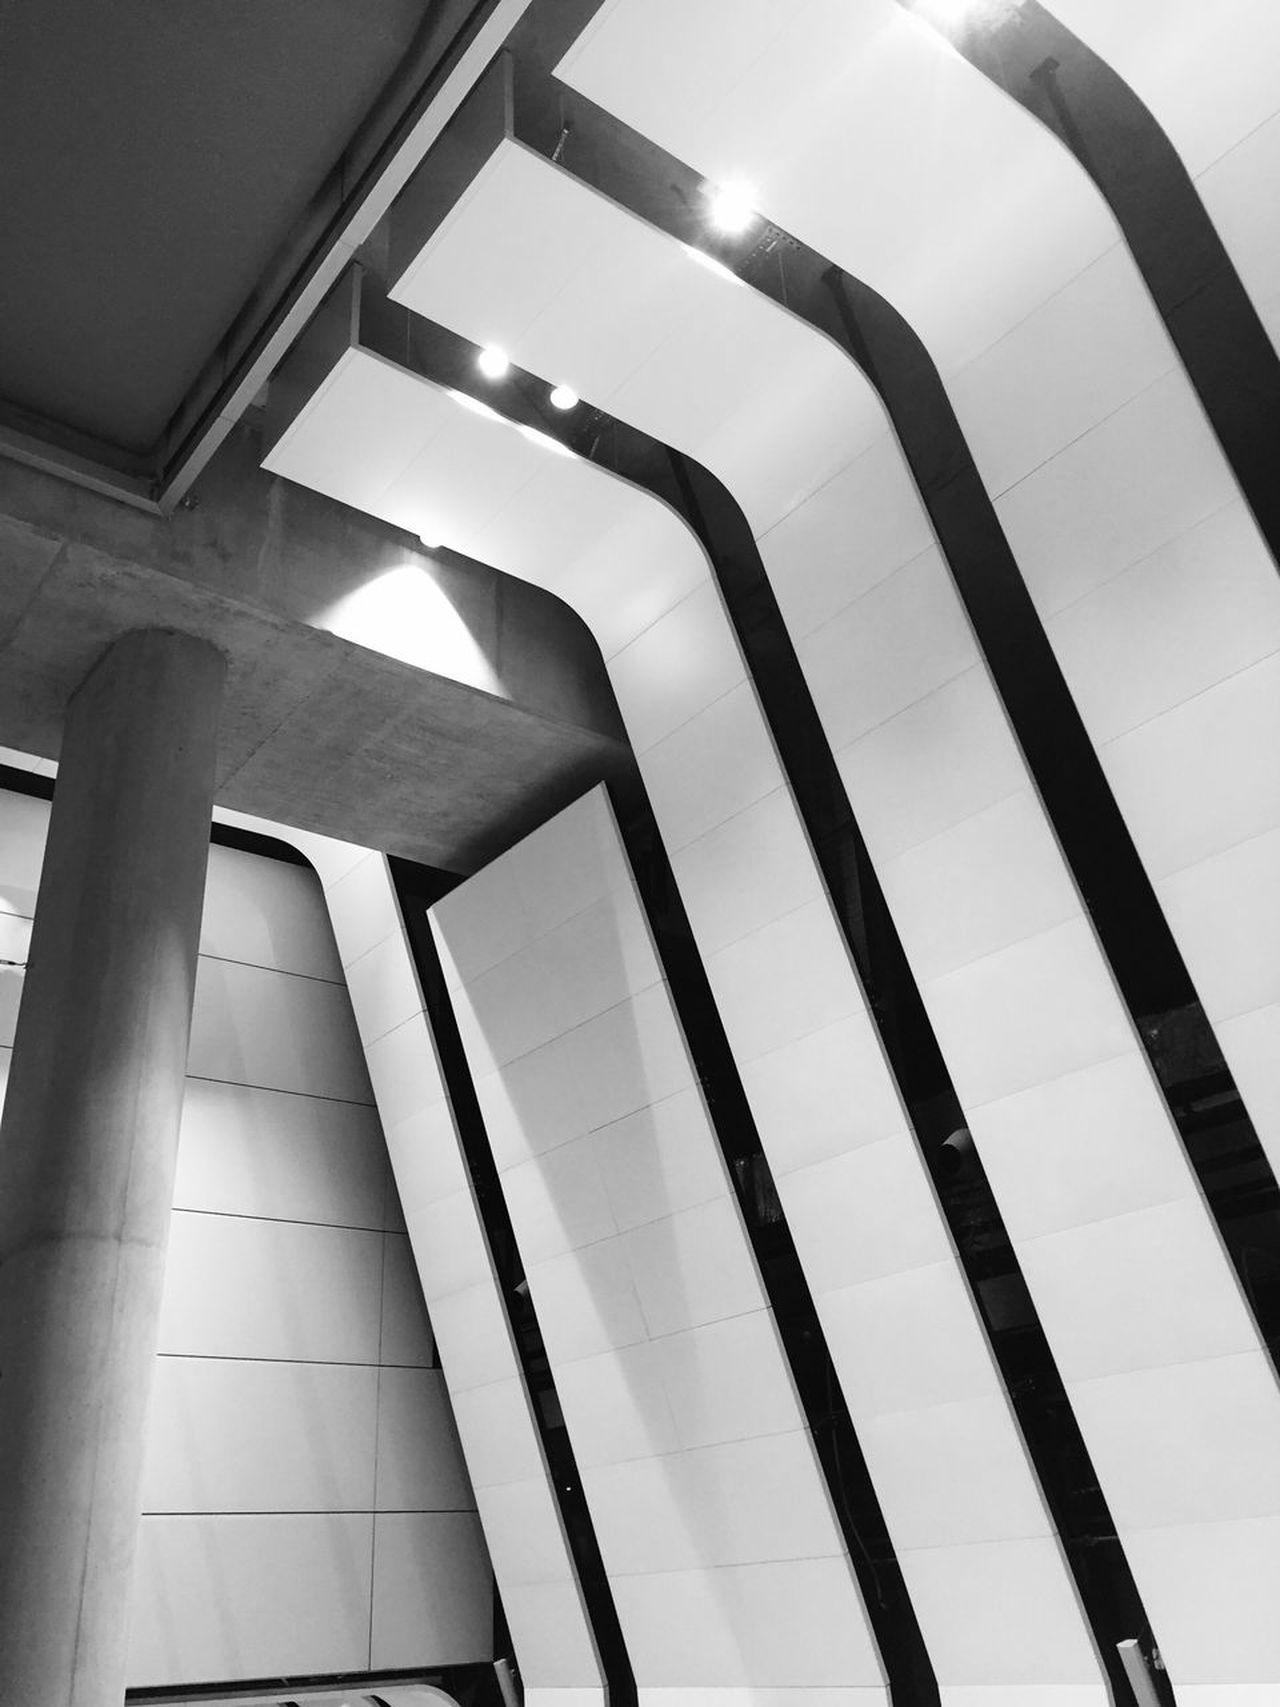 Arriving at Heathrow Terminal 5. Home sweet home :) Iphone6 Blackandwhite Light Interior Design Interior Building Design